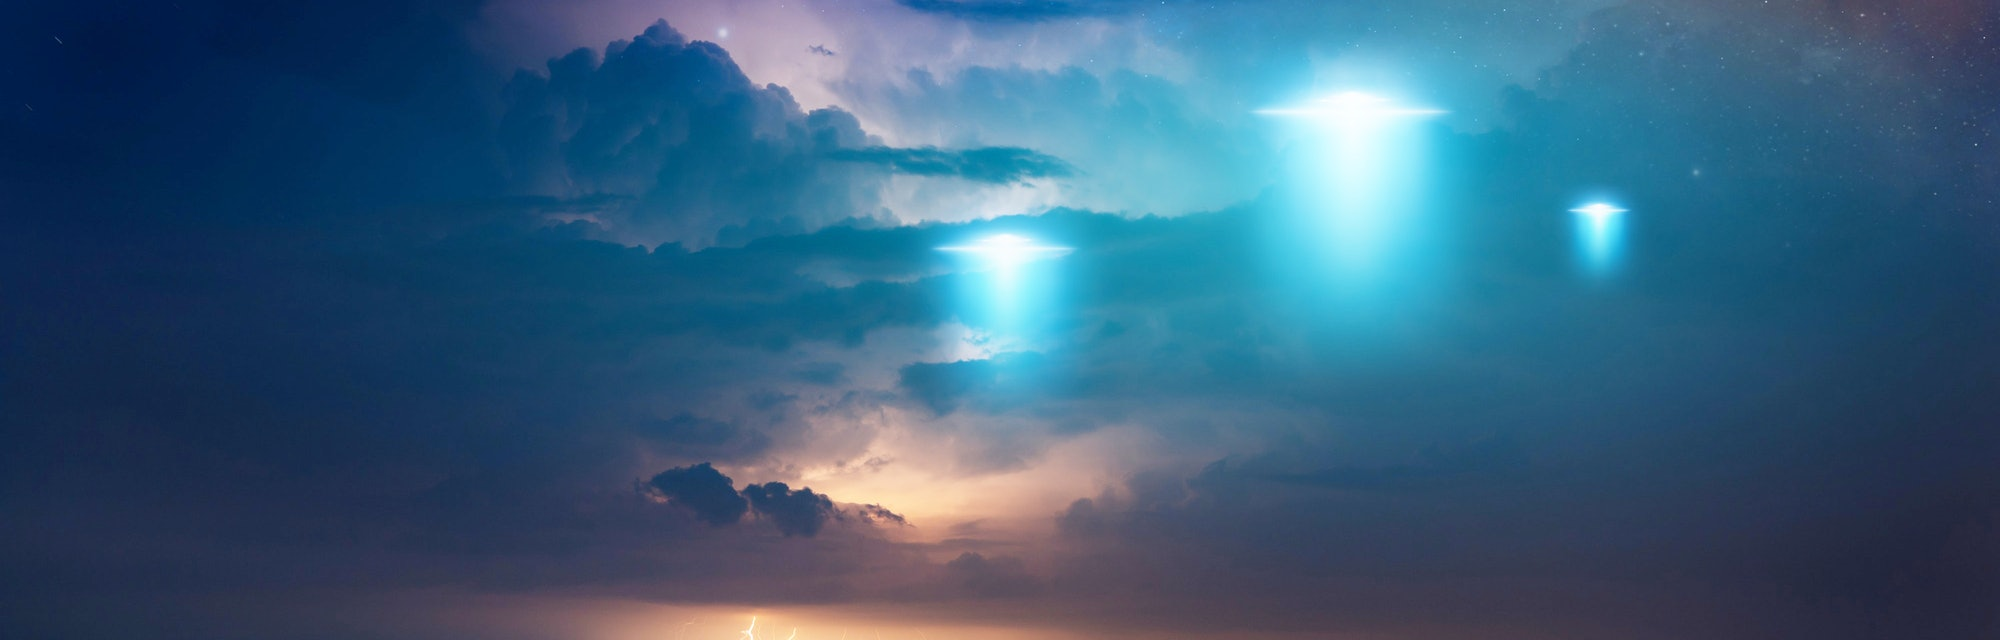 dark skies with lightning that looks like ufos